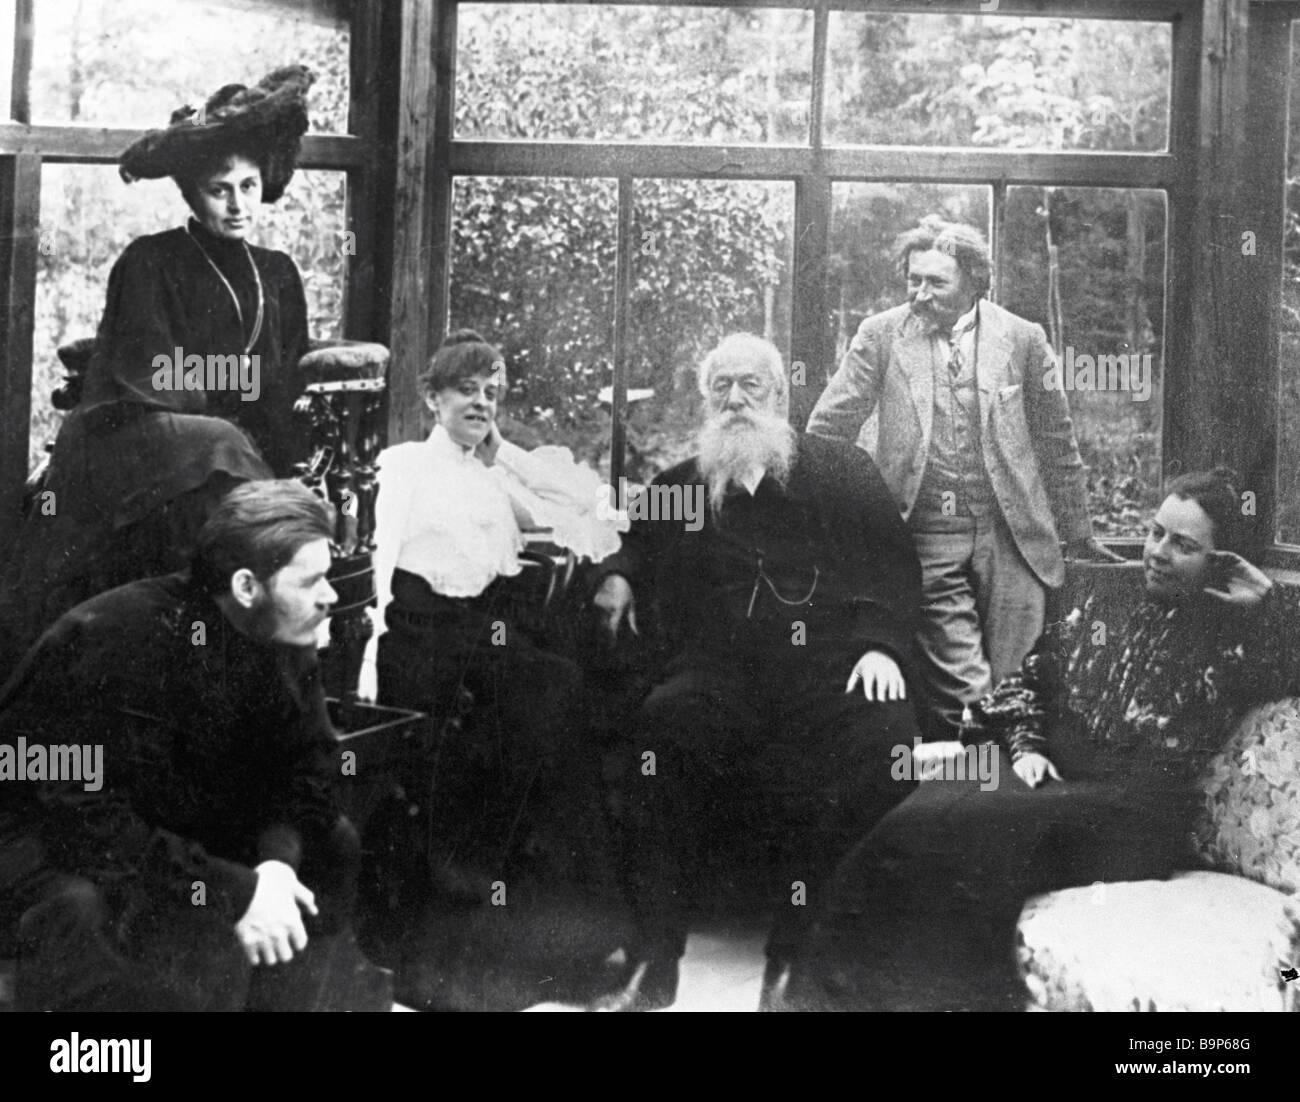 Un Gorki M M F Andreyeva L N V V Yakovleva Stasov JE Ye Repin et Norman B P Severova à partir de la gauche Photo Stock